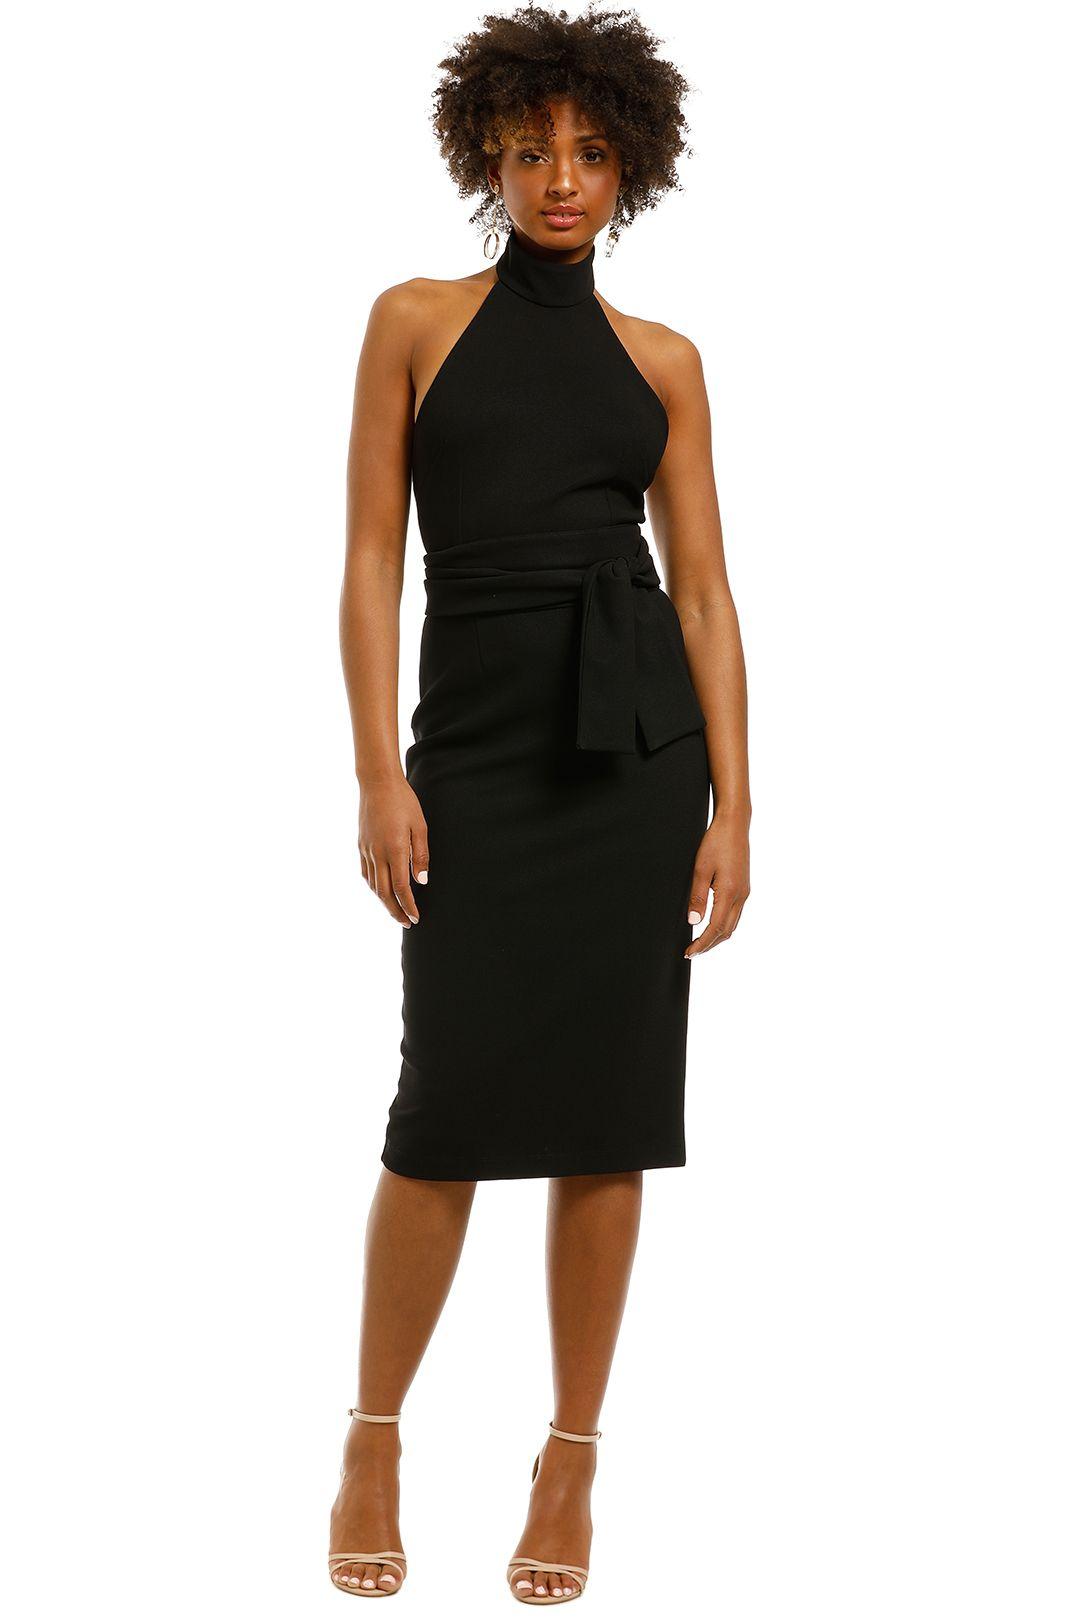 Pasduchas-Aurelia-High-Midi-Dress-Black-Front